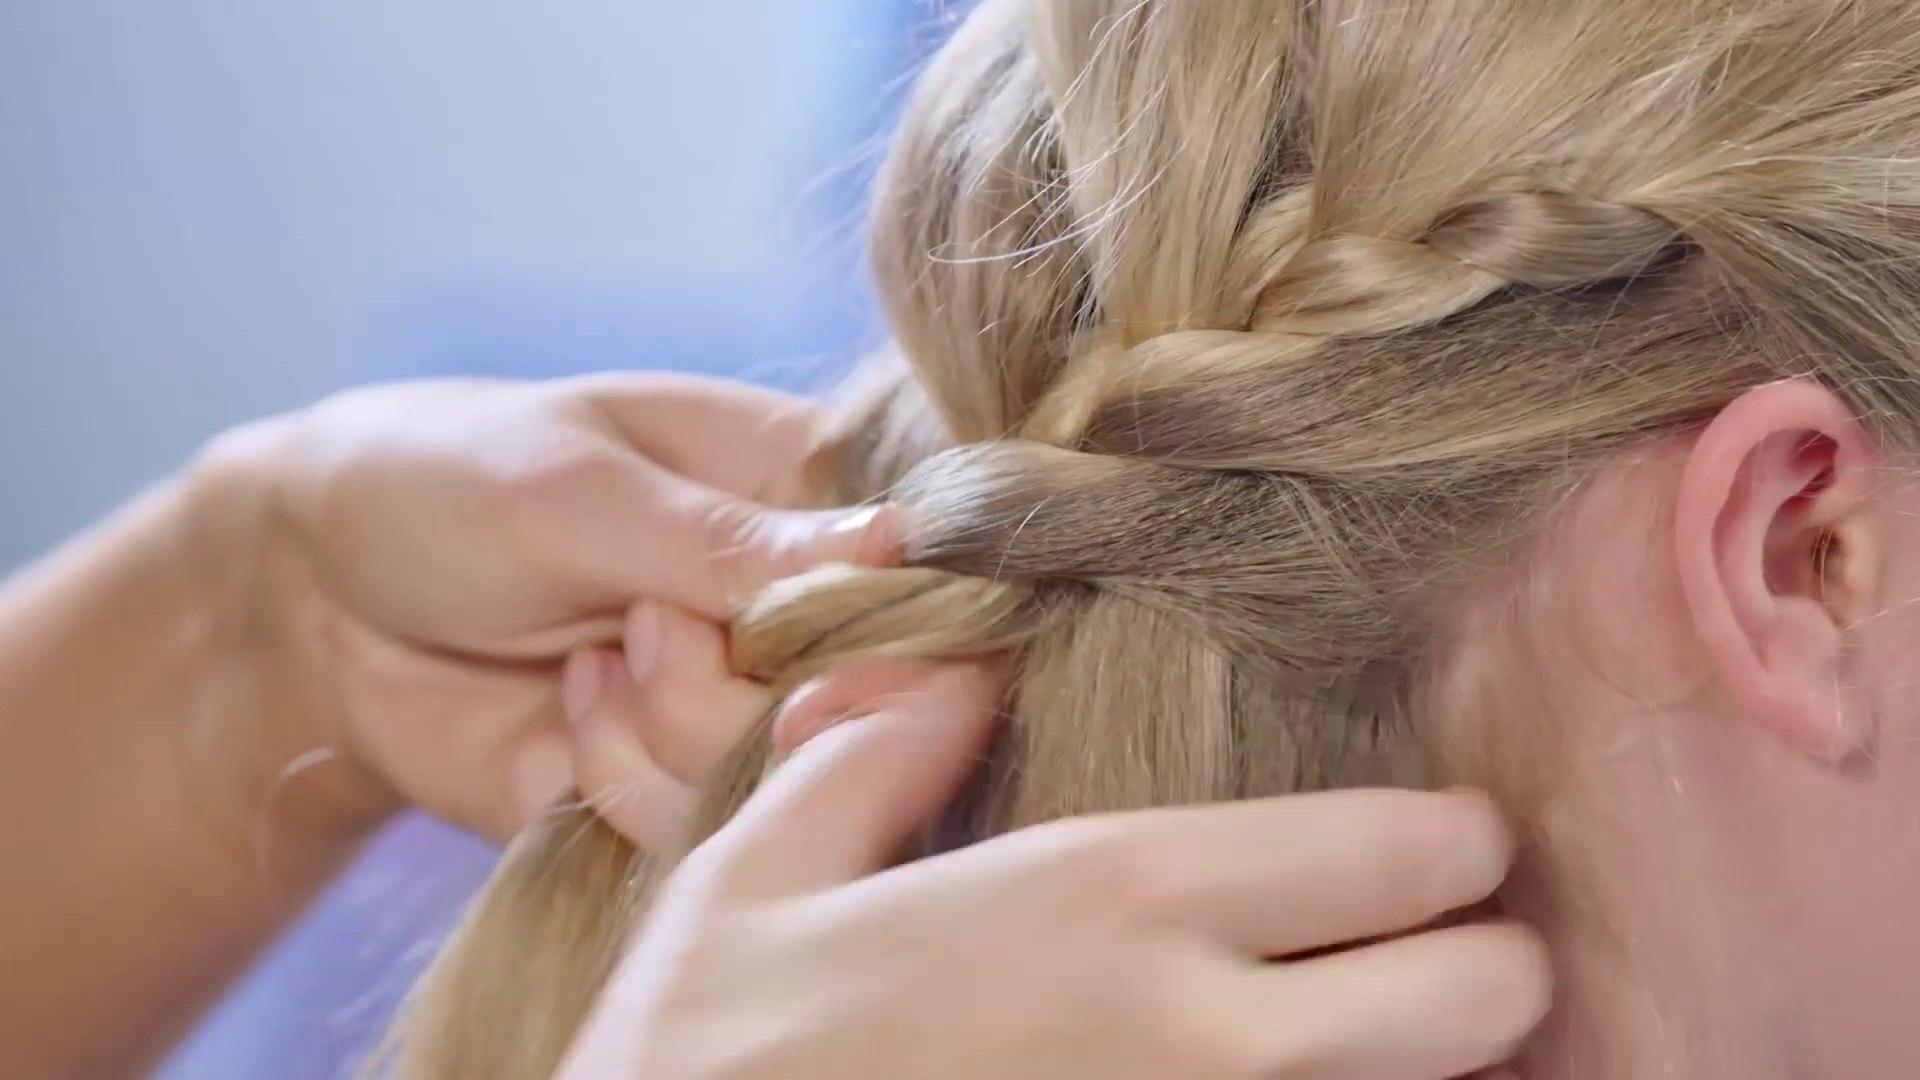 Frozen 12 Movie - Hair Tutorial - Elsa Hair Plait